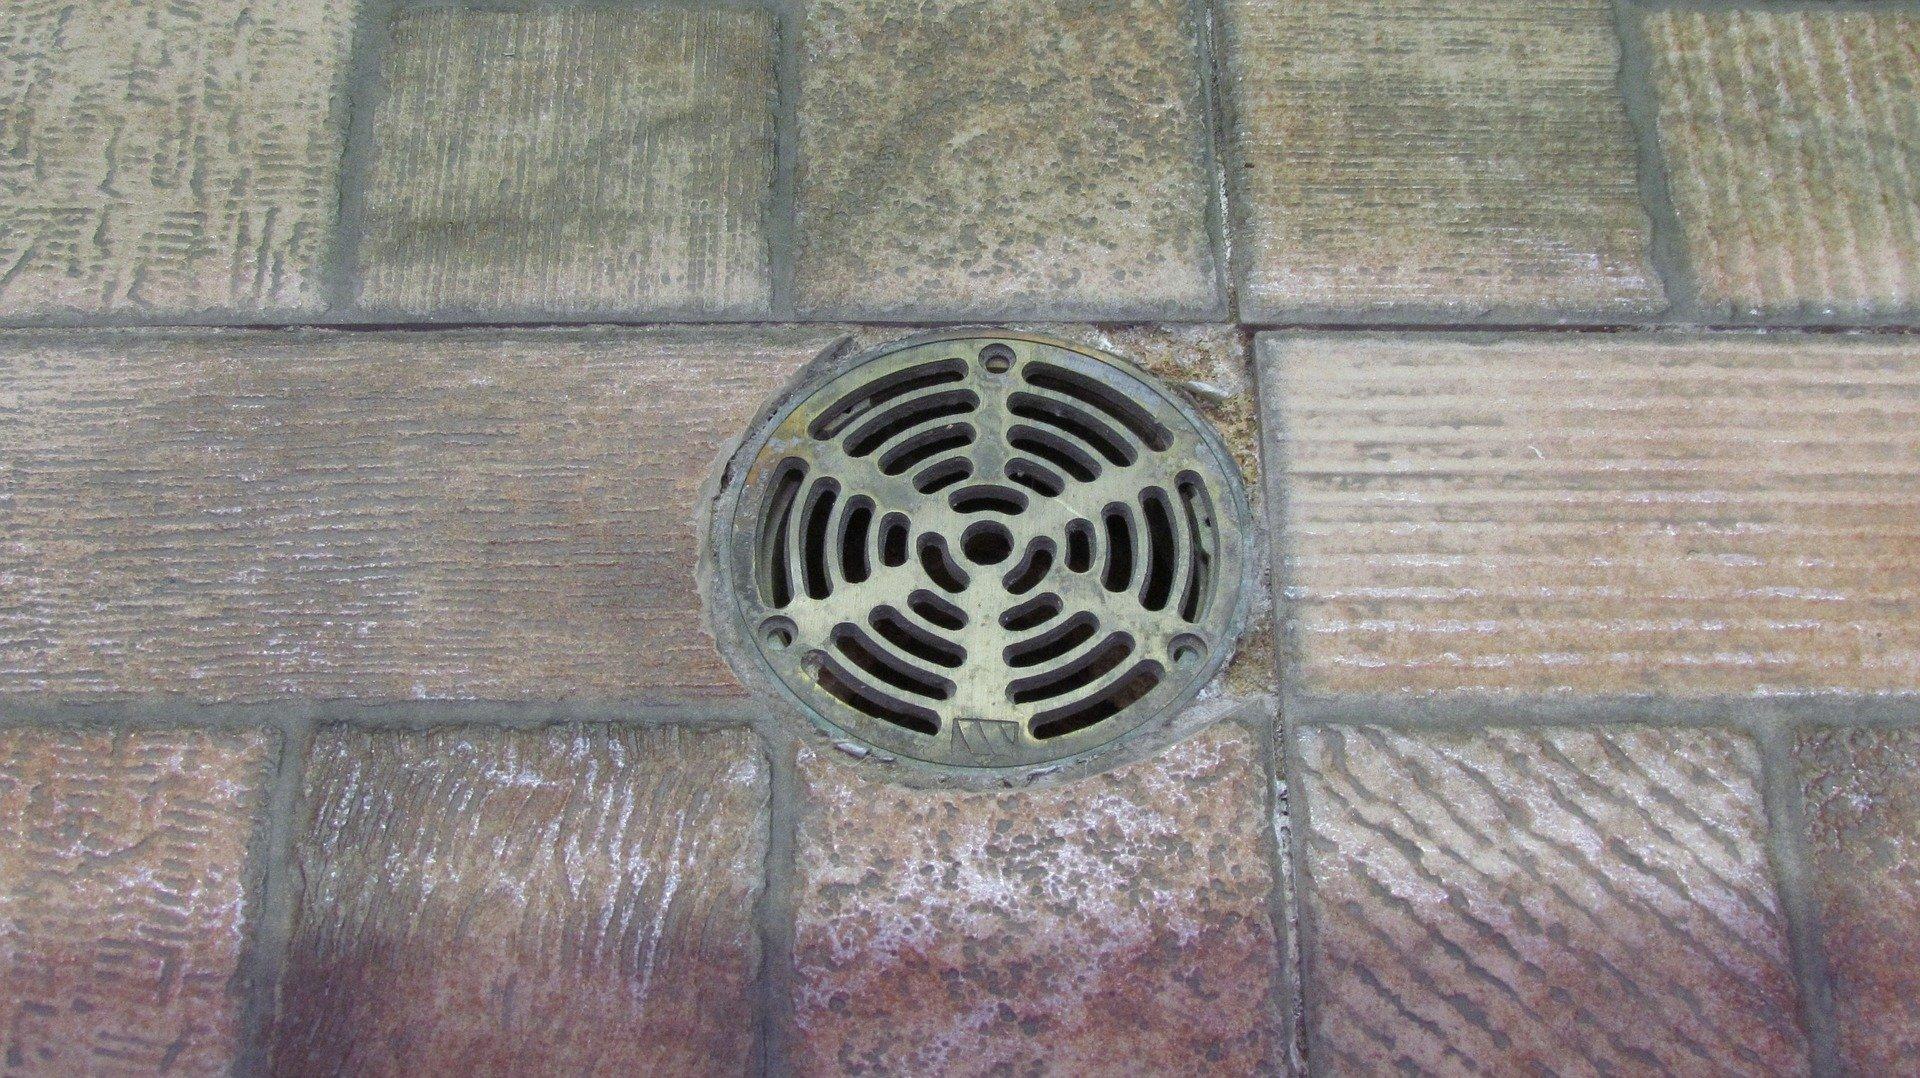 Bat Floor Drain Cleaning Services